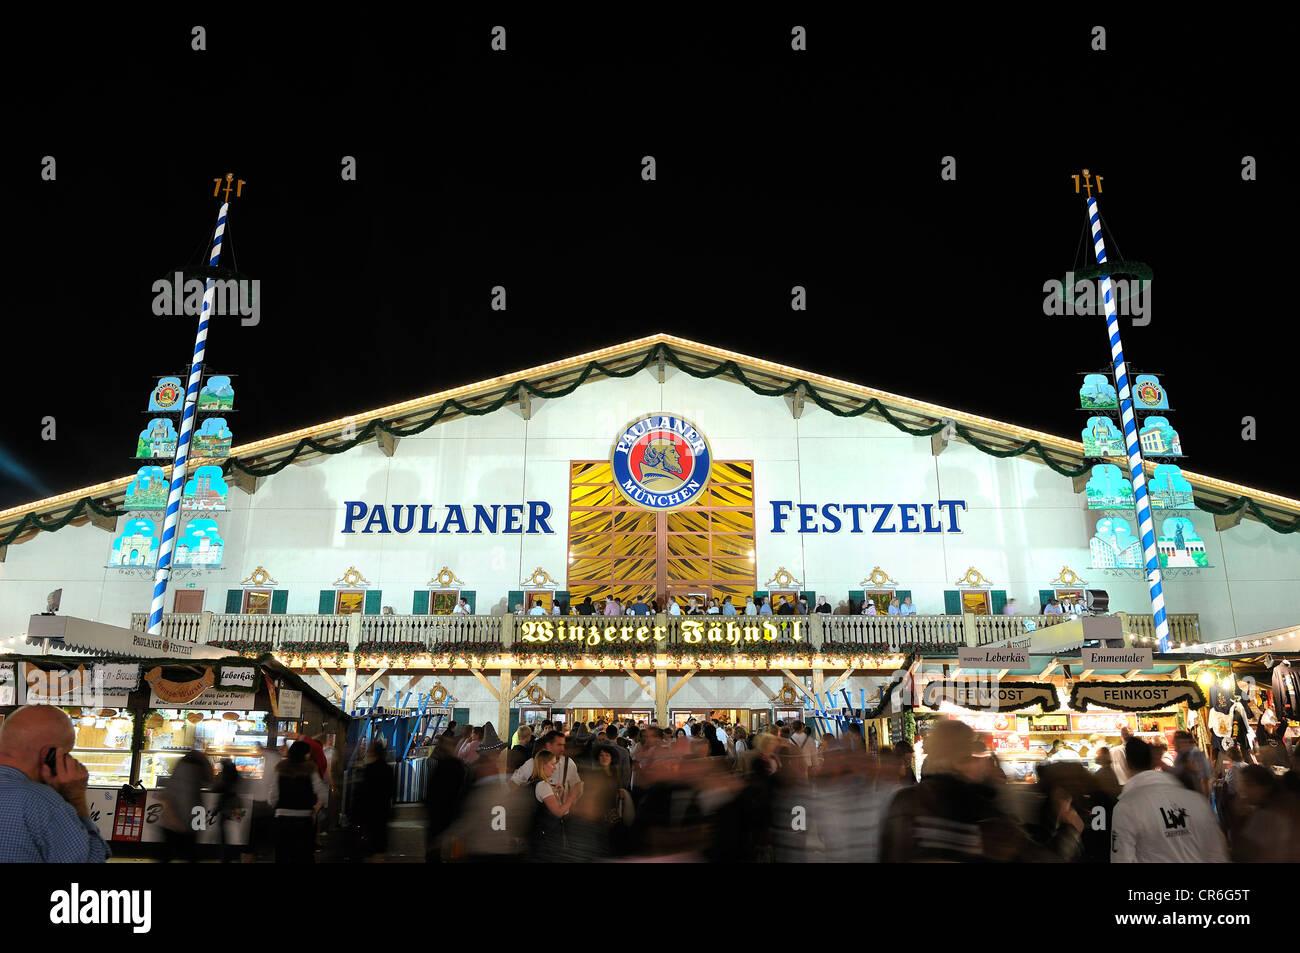 Brightly illuminated Paulaner Brauerei Winzerer Faehnd'l festival tent at night, Oktoberfest 2010, Munich, Upper - Stock Image